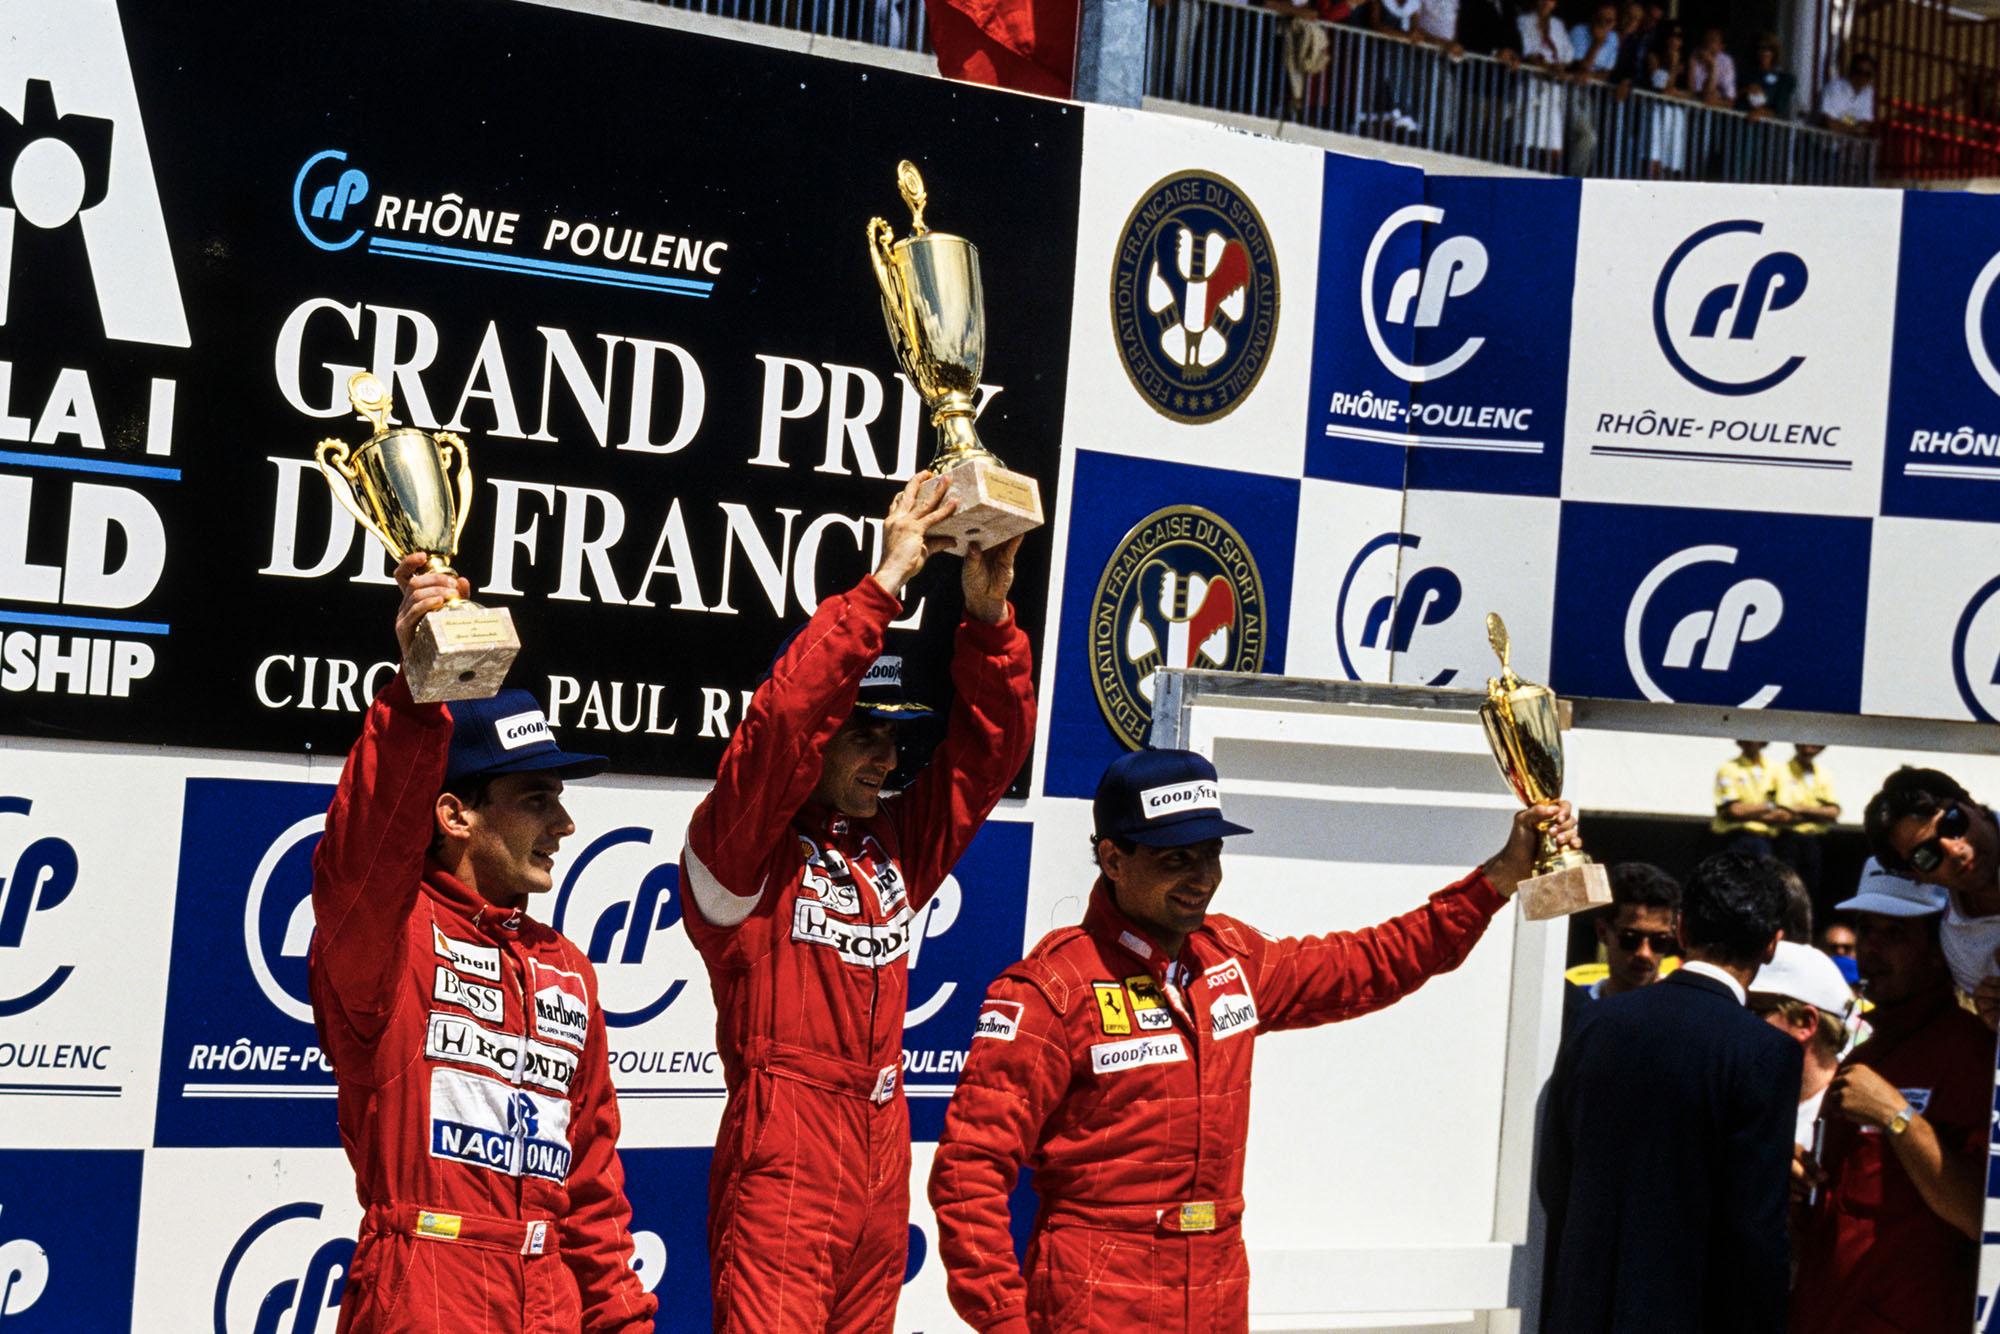 1988 FRA GP podium